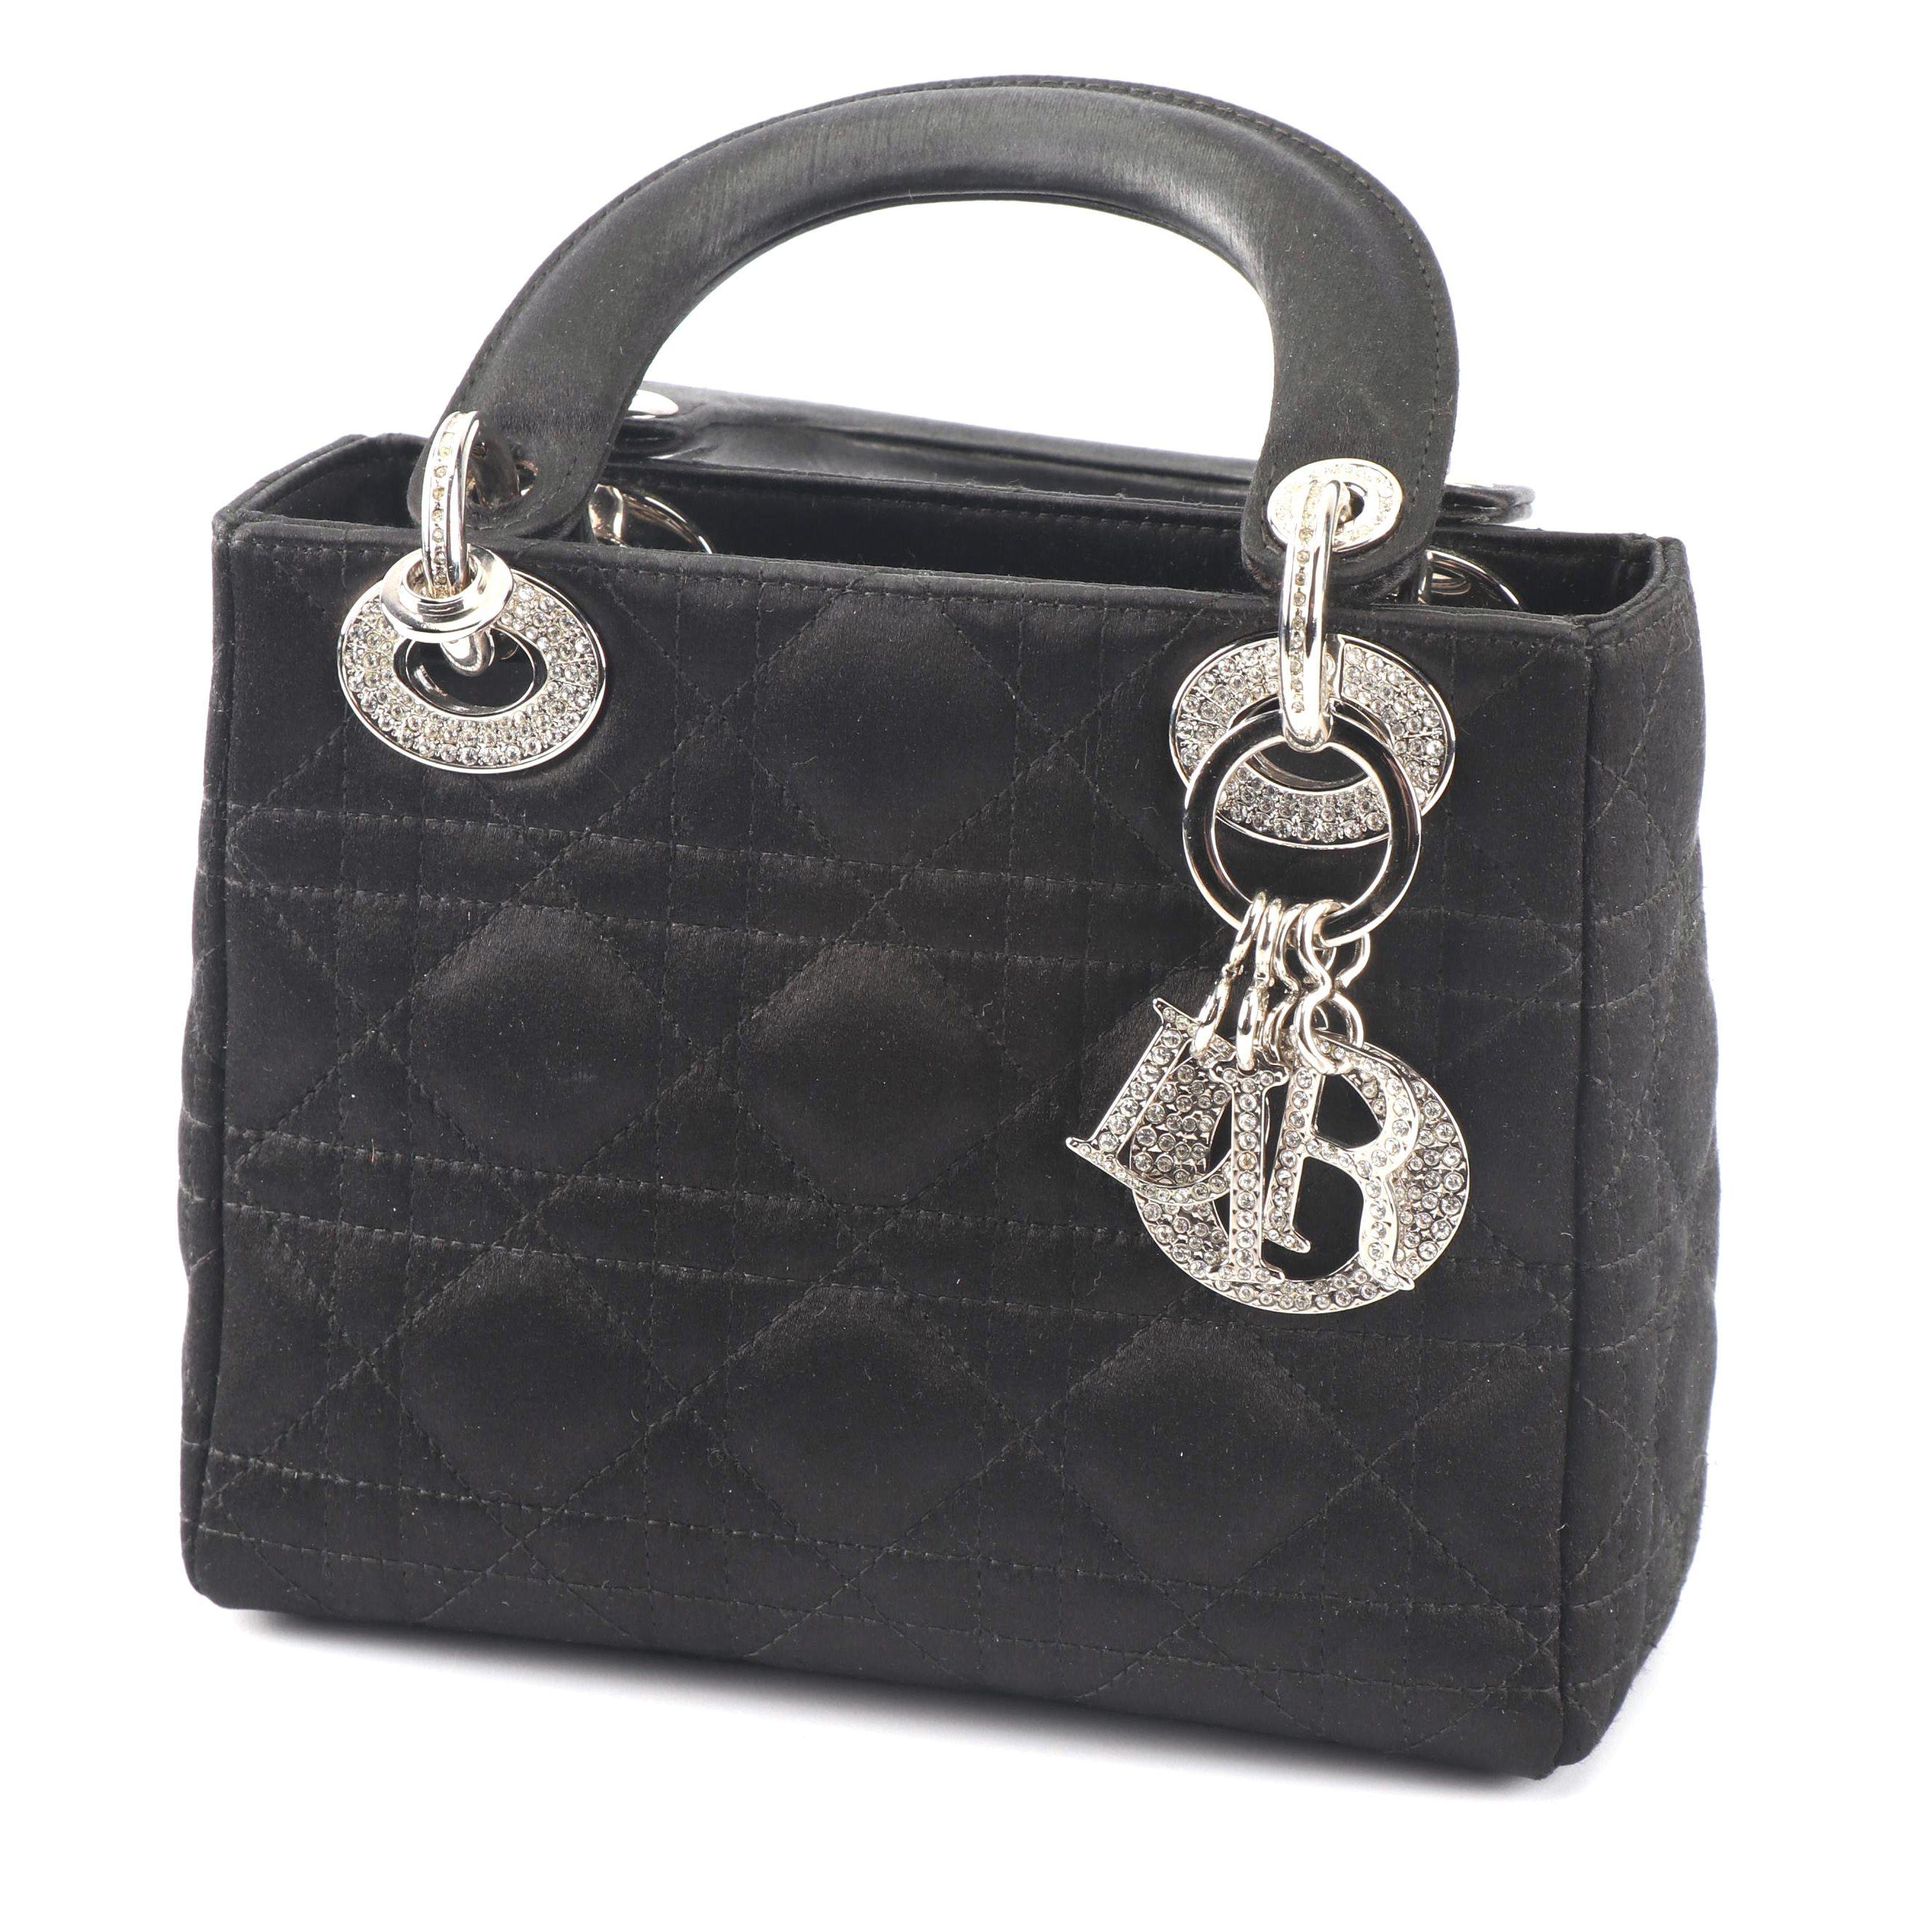 Christian Dior Lady Dior Quilted Black Satin Handbag